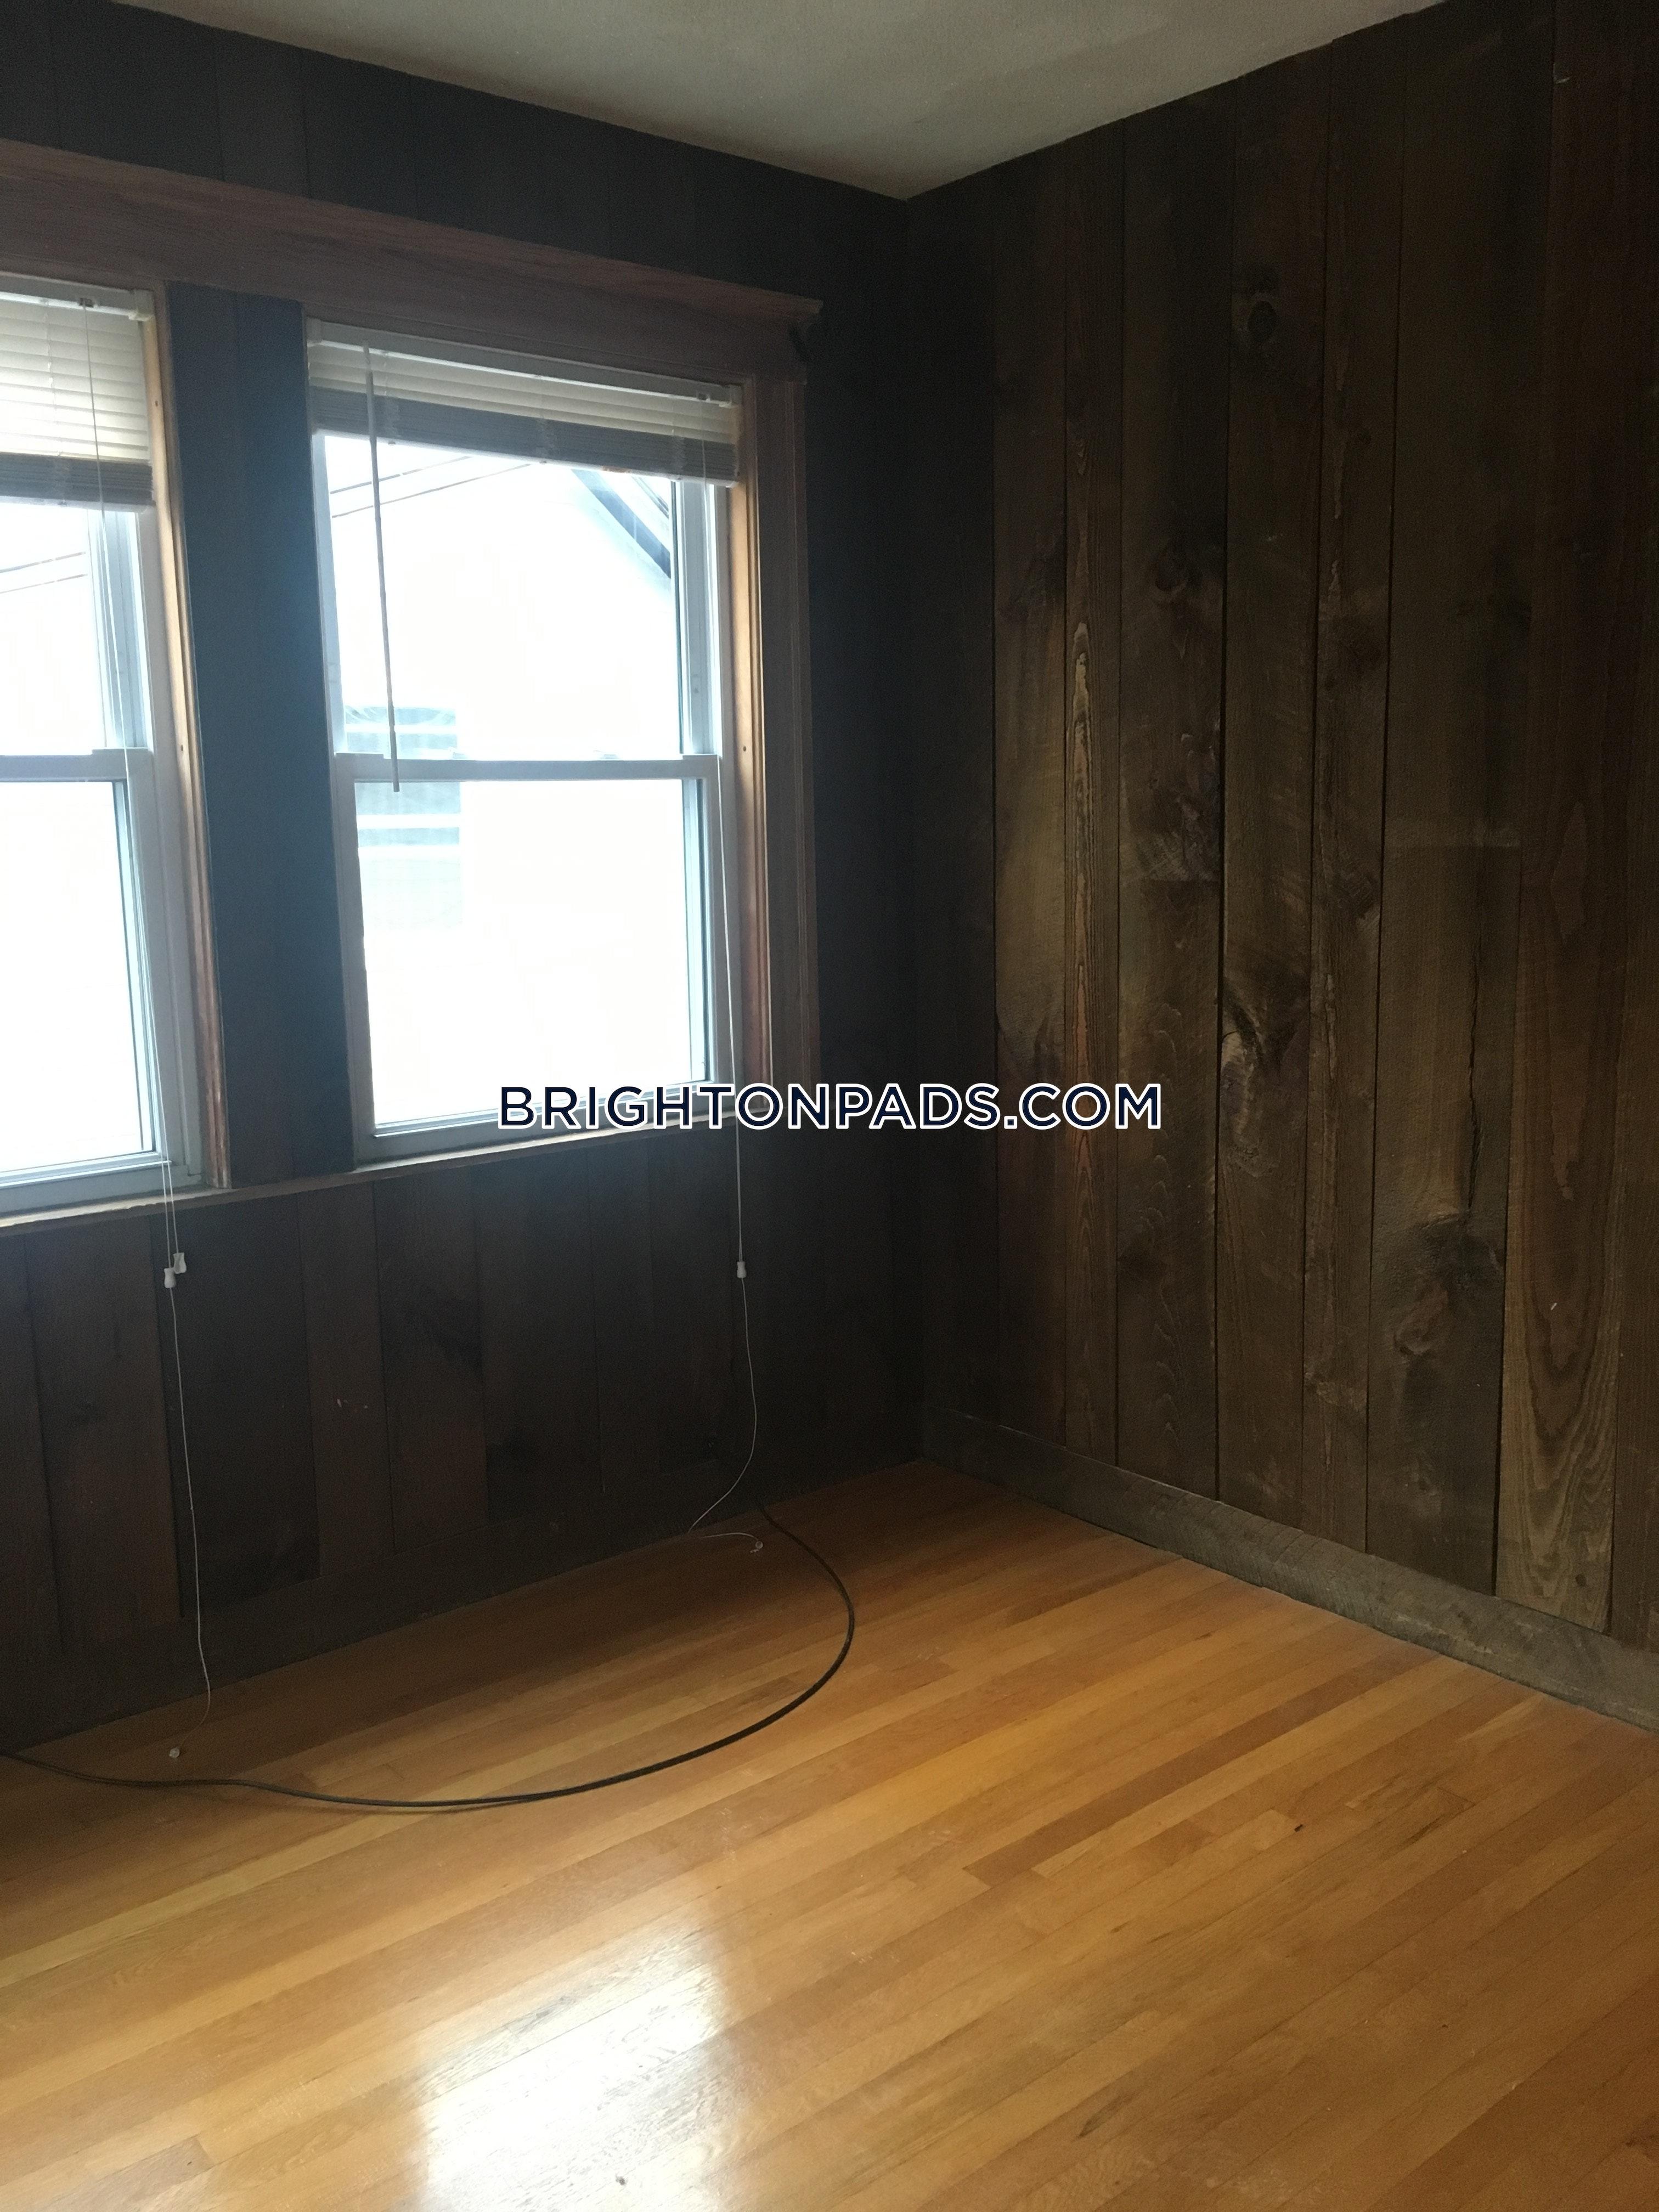 BOSTON - BRIGHTON - BOSTON COLLEGE - $3,600